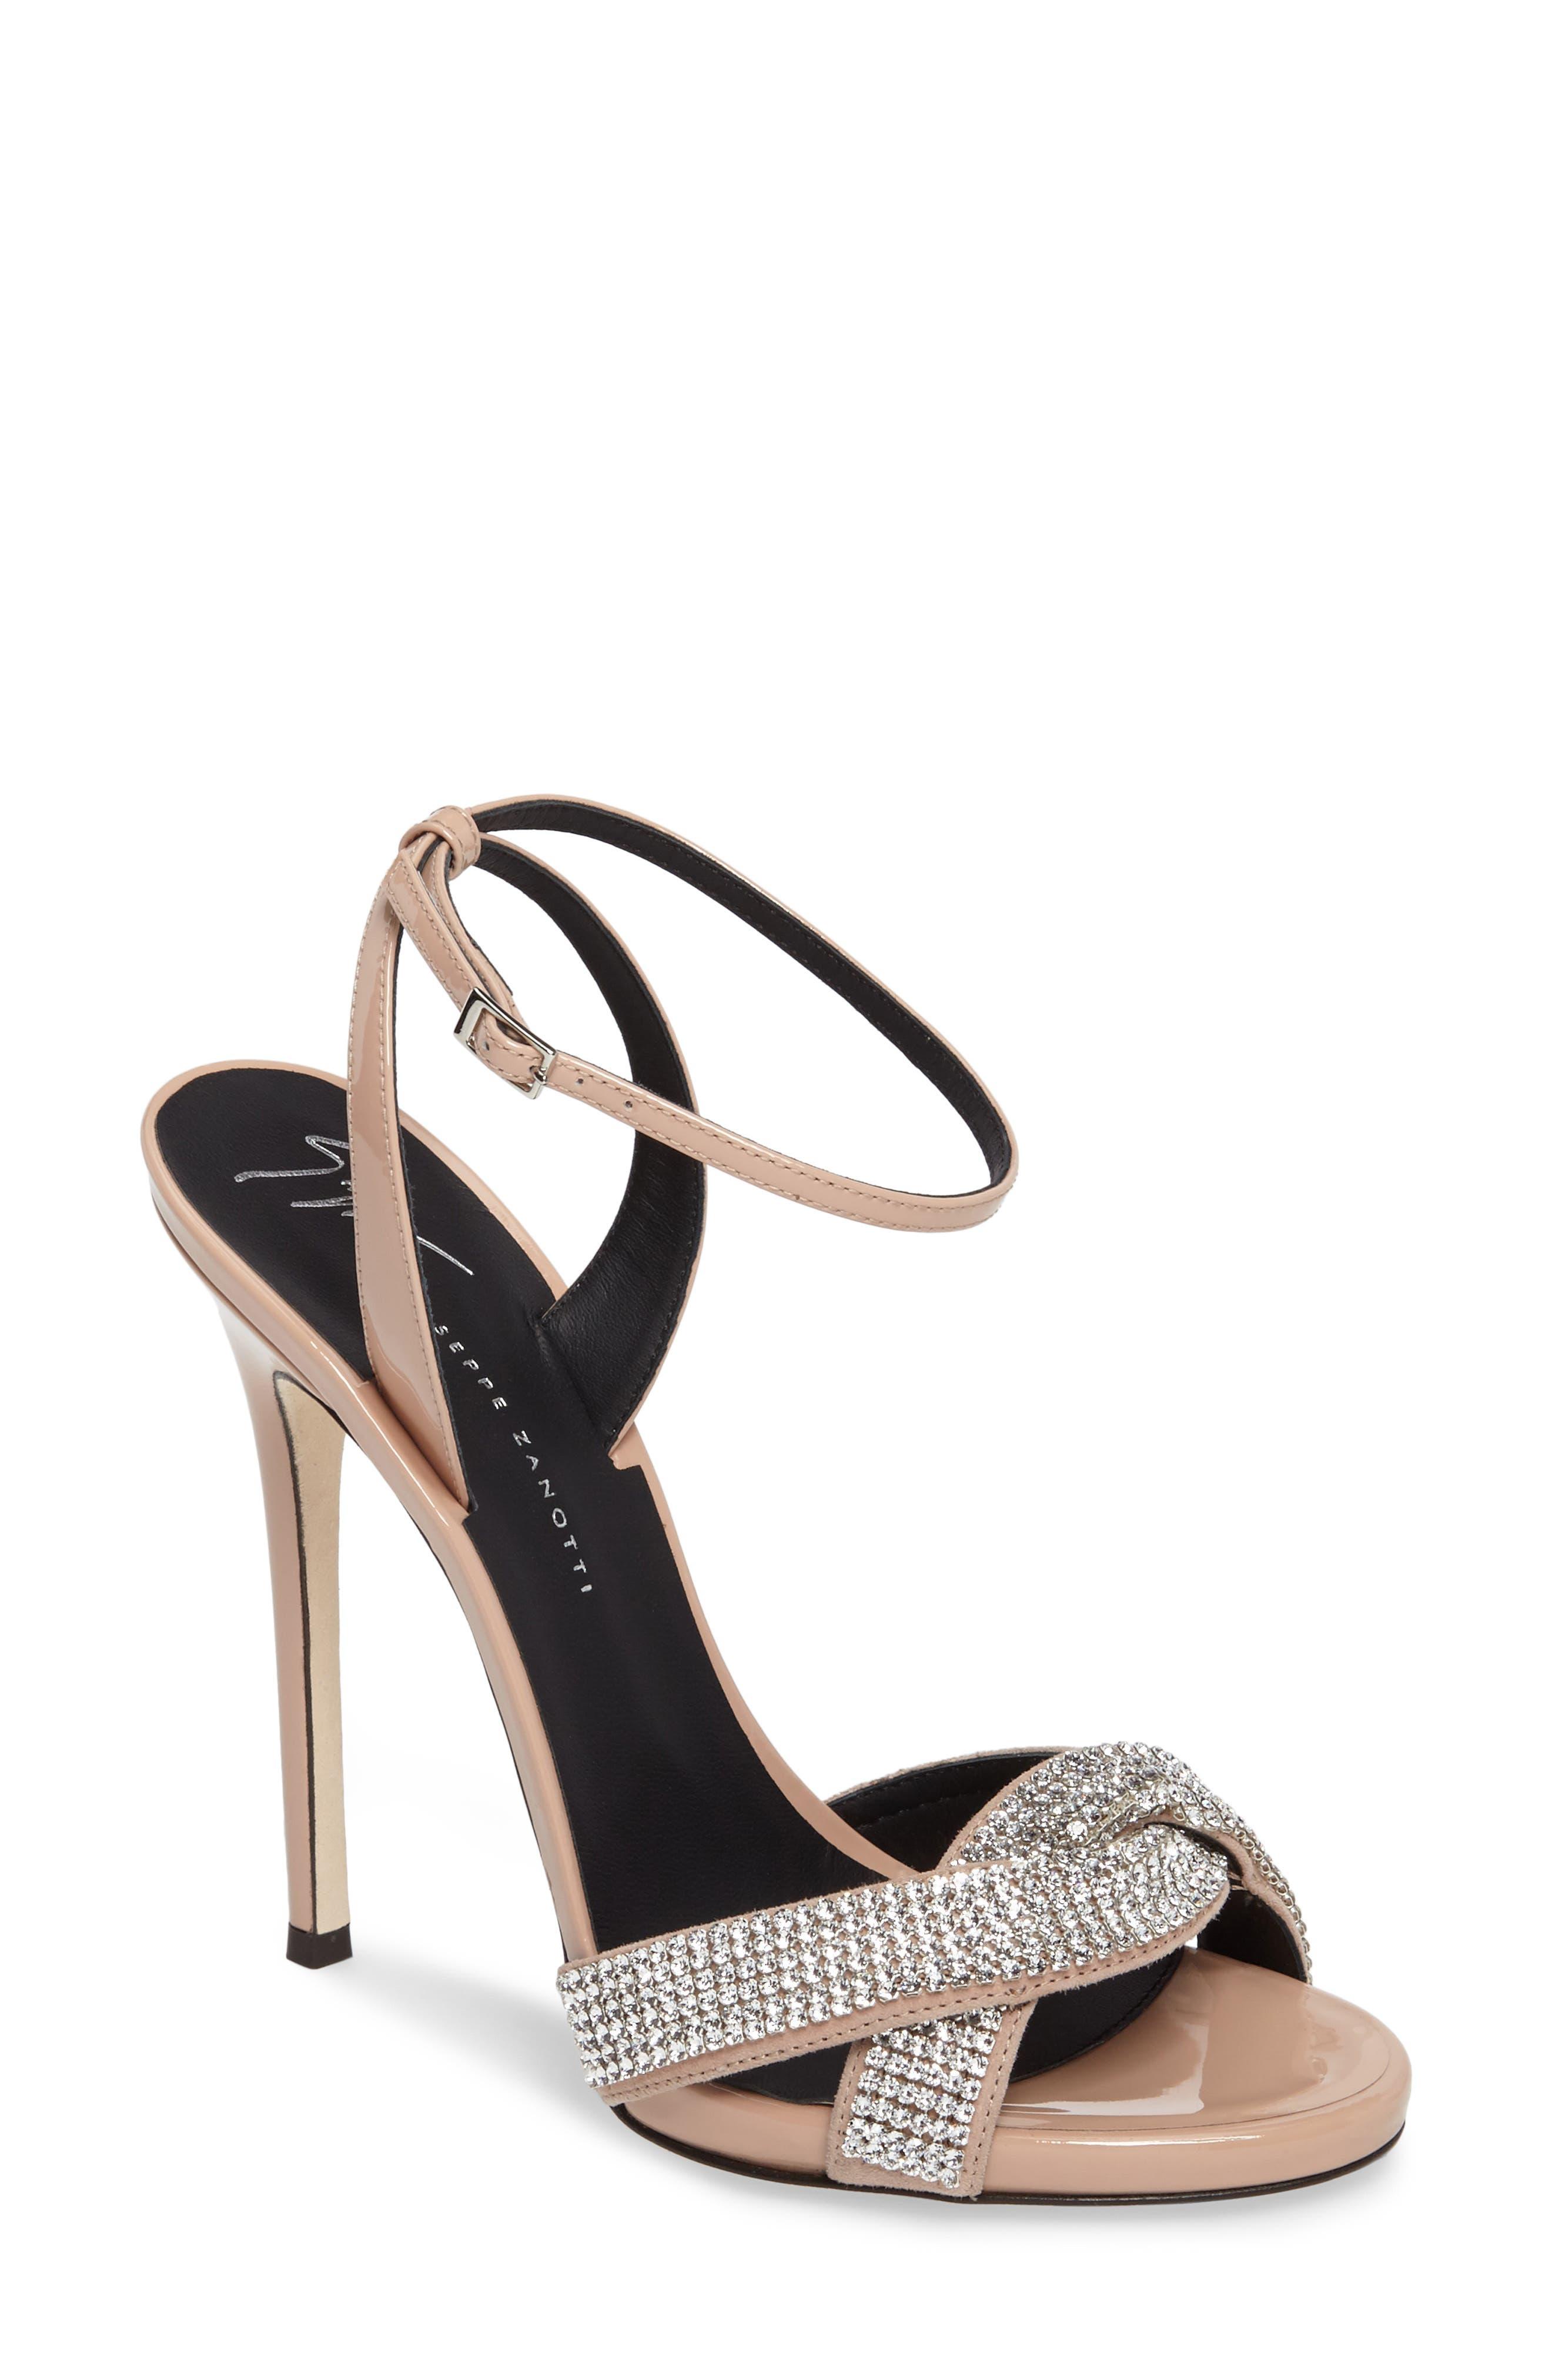 Main Image - Giuseppe Zanotti Embellished Wrap Strap Sandal (Women)